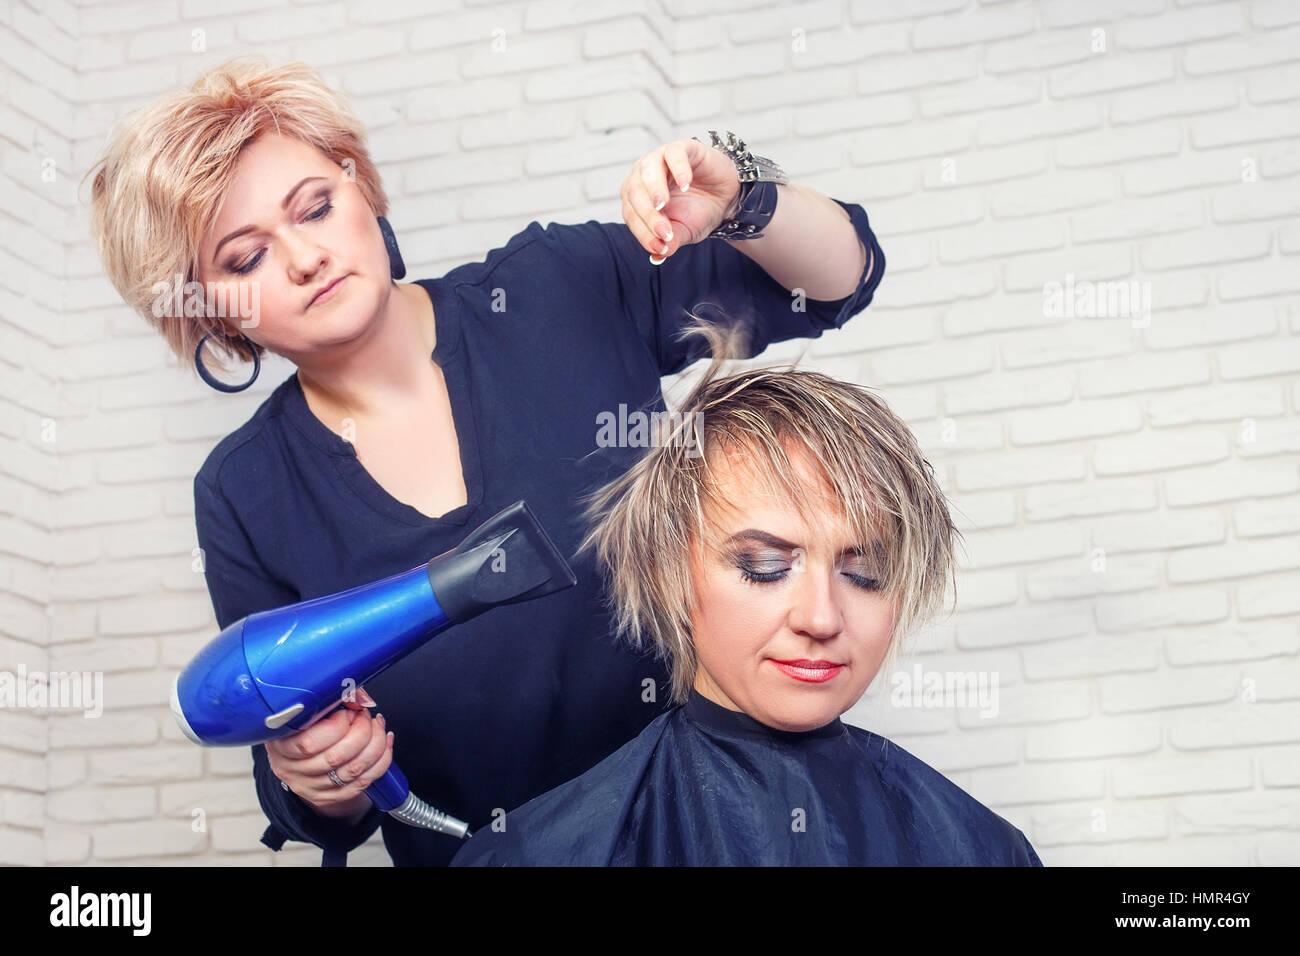 Friseur mit Fön Stockbild